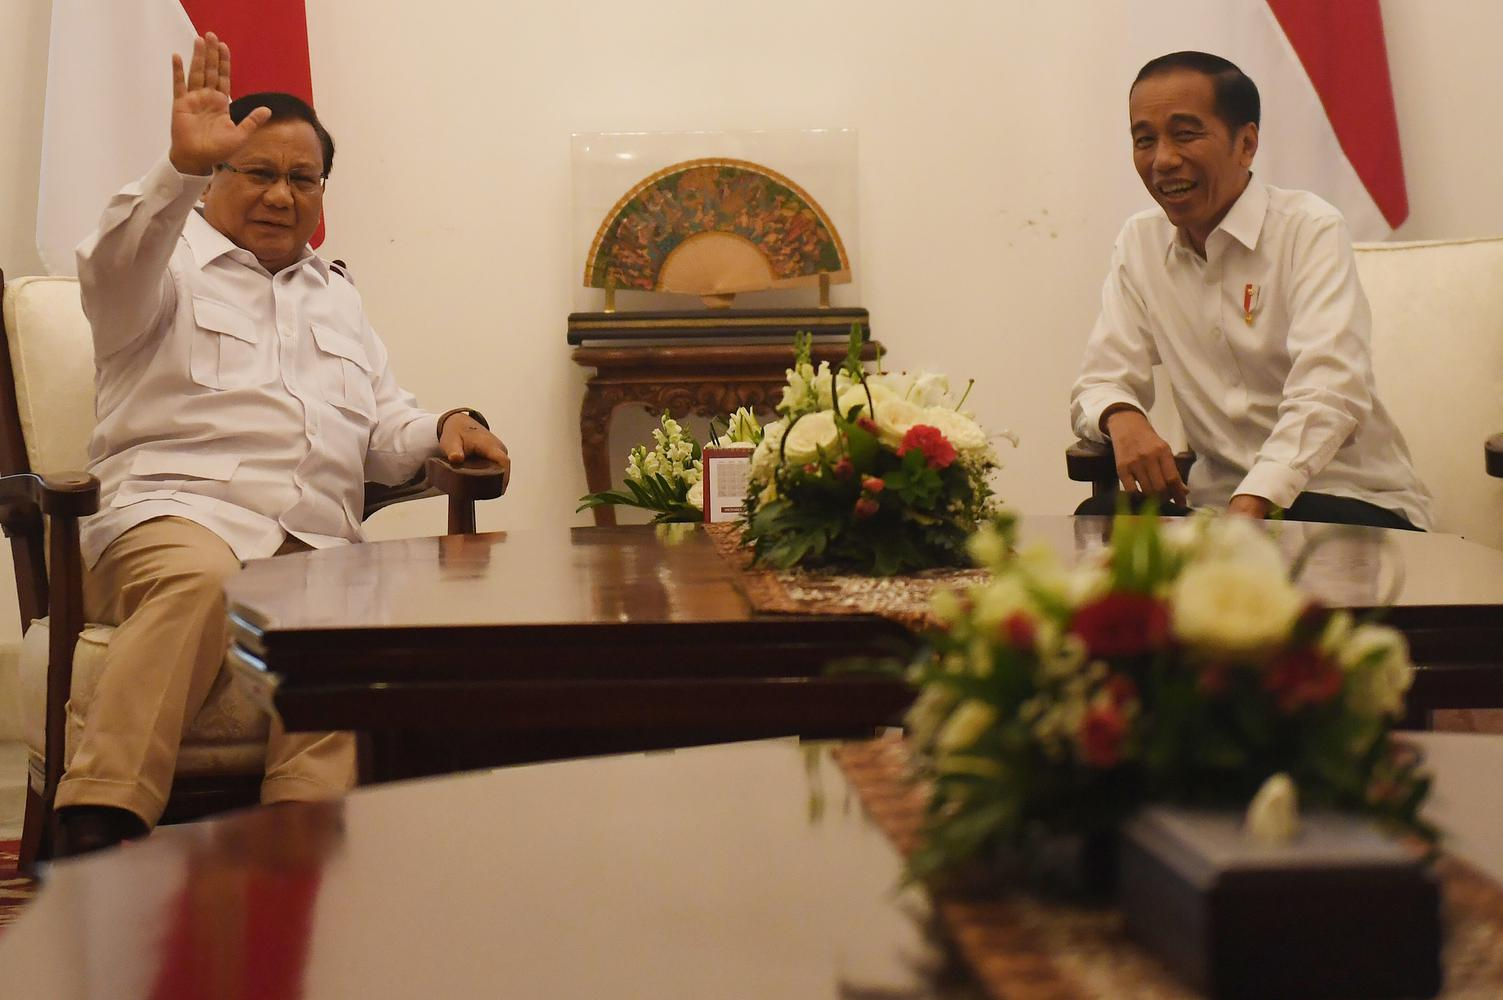 Kabinet Jokowi, Prabowo, Menteri Jokowi, Kabinet Jokowi Maruf